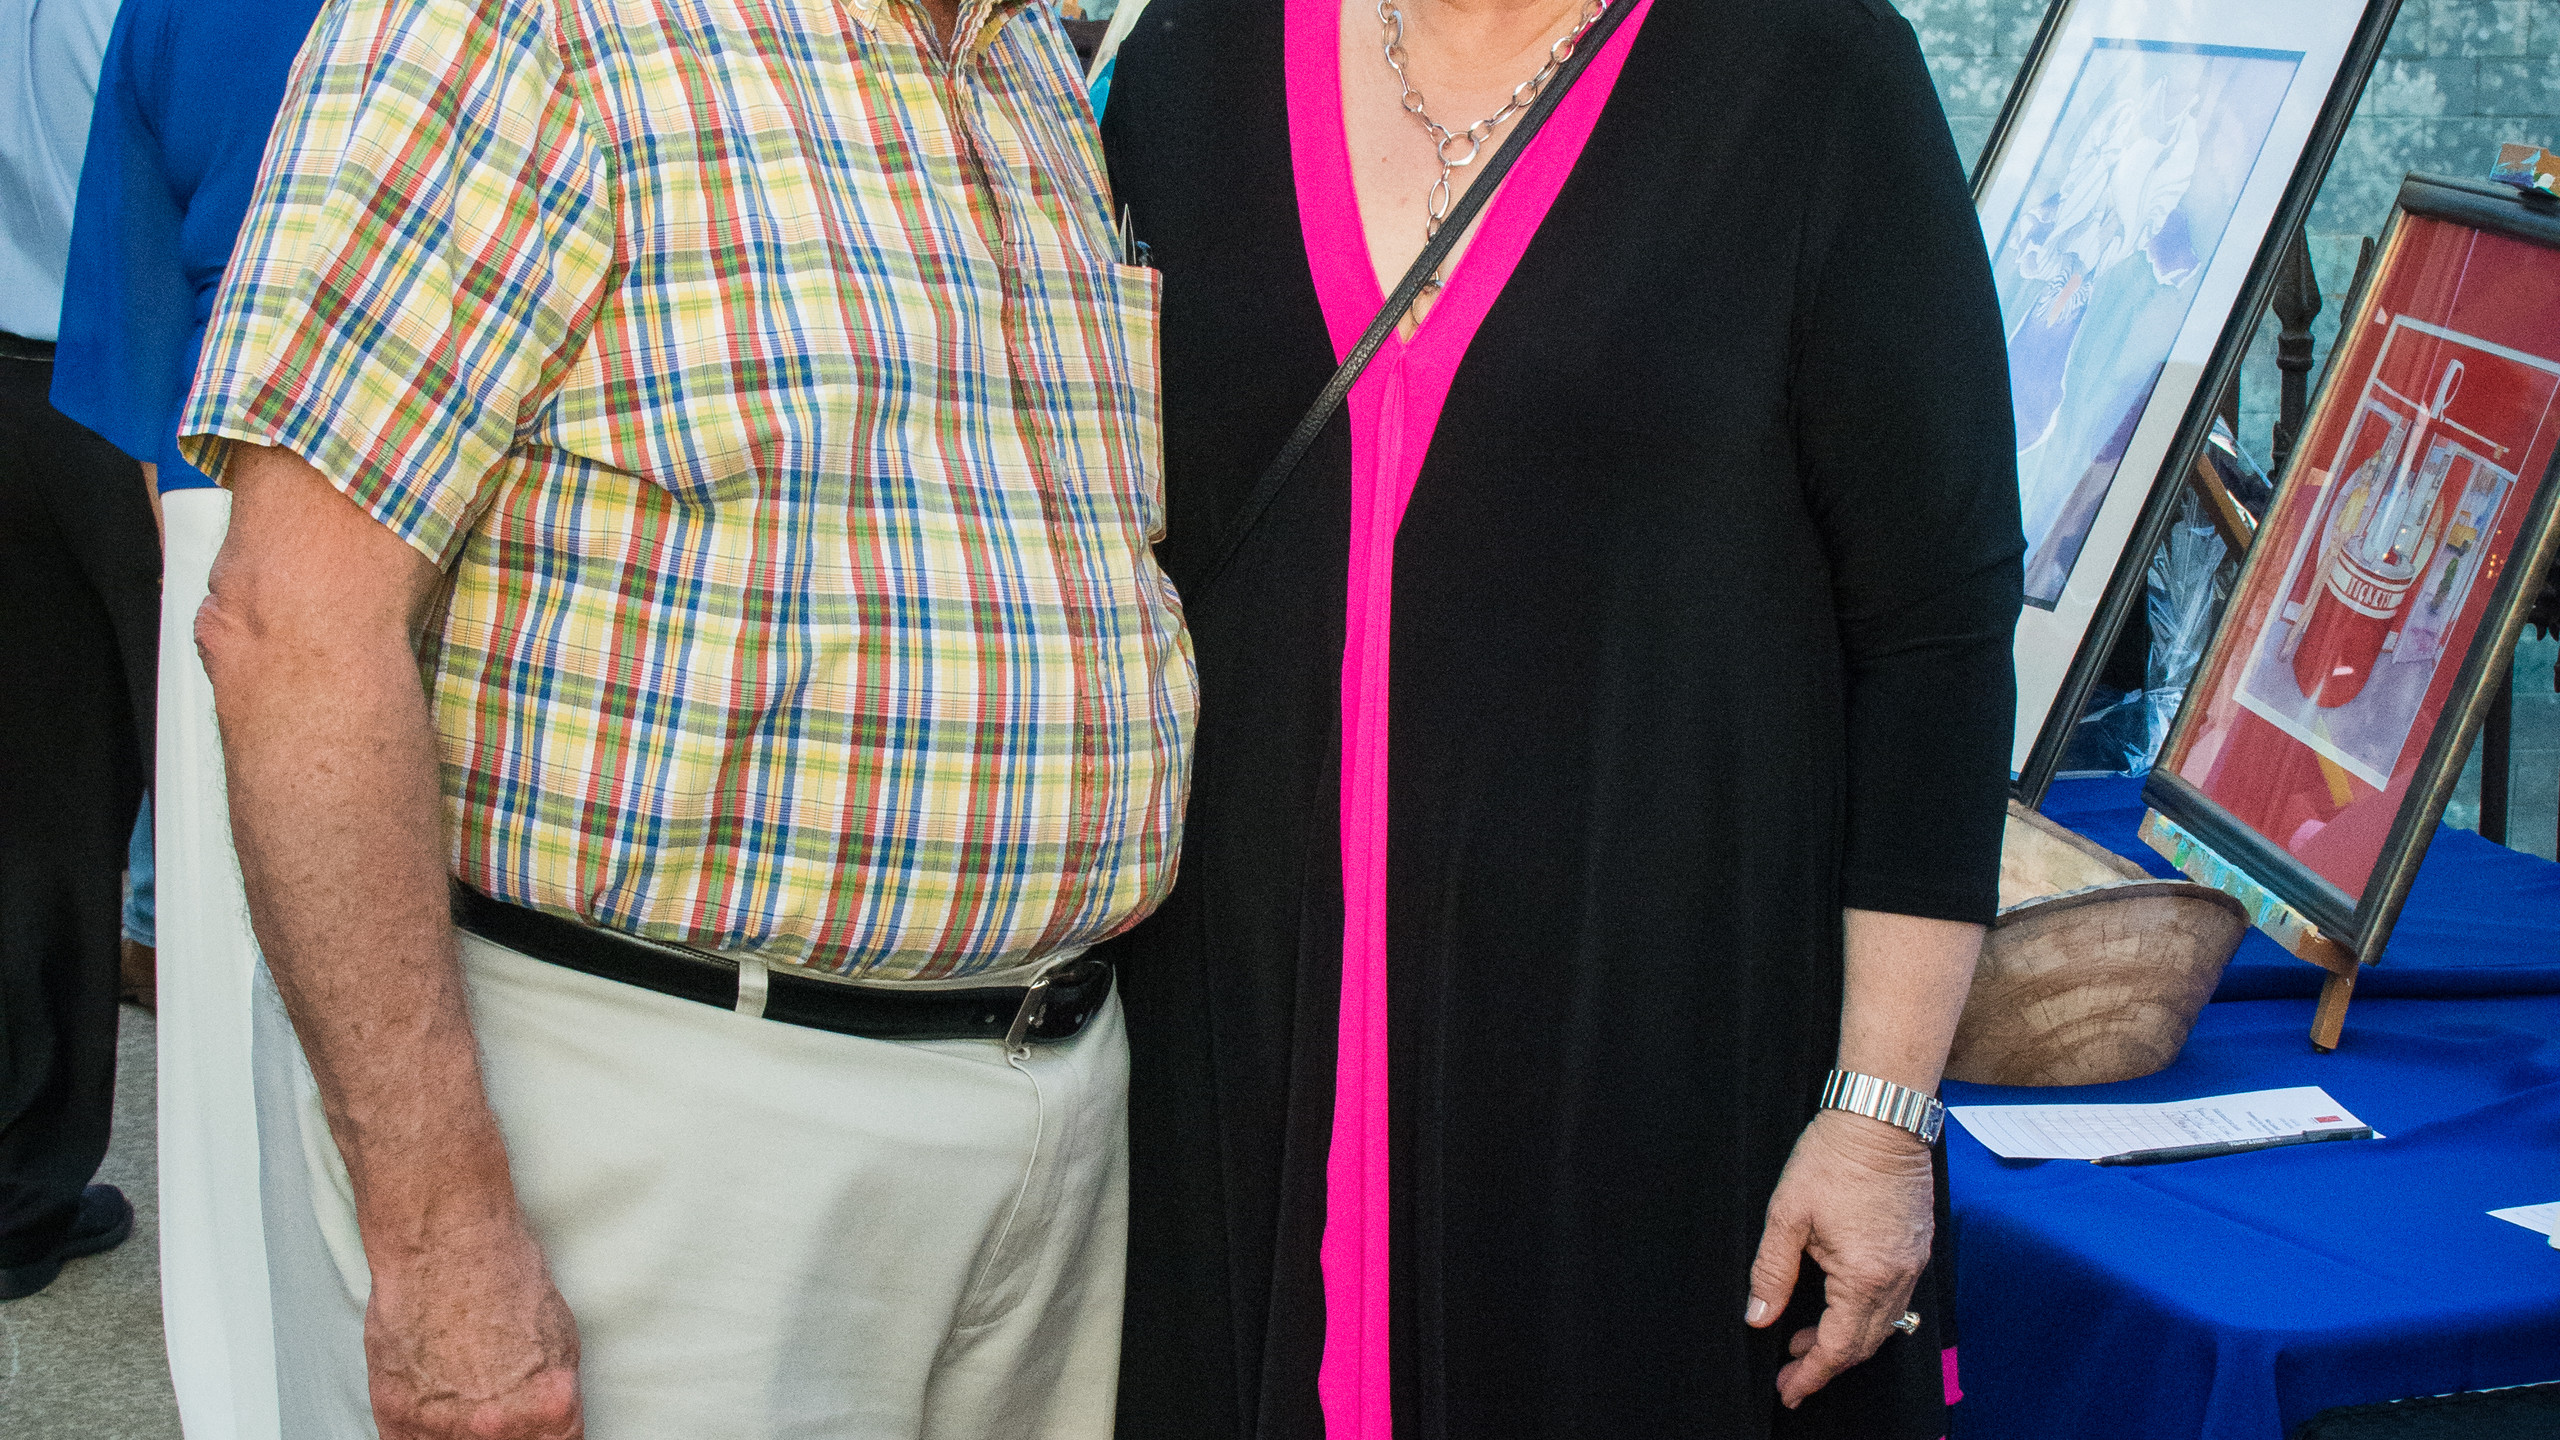 Jim Mann and Dr. Elisa White